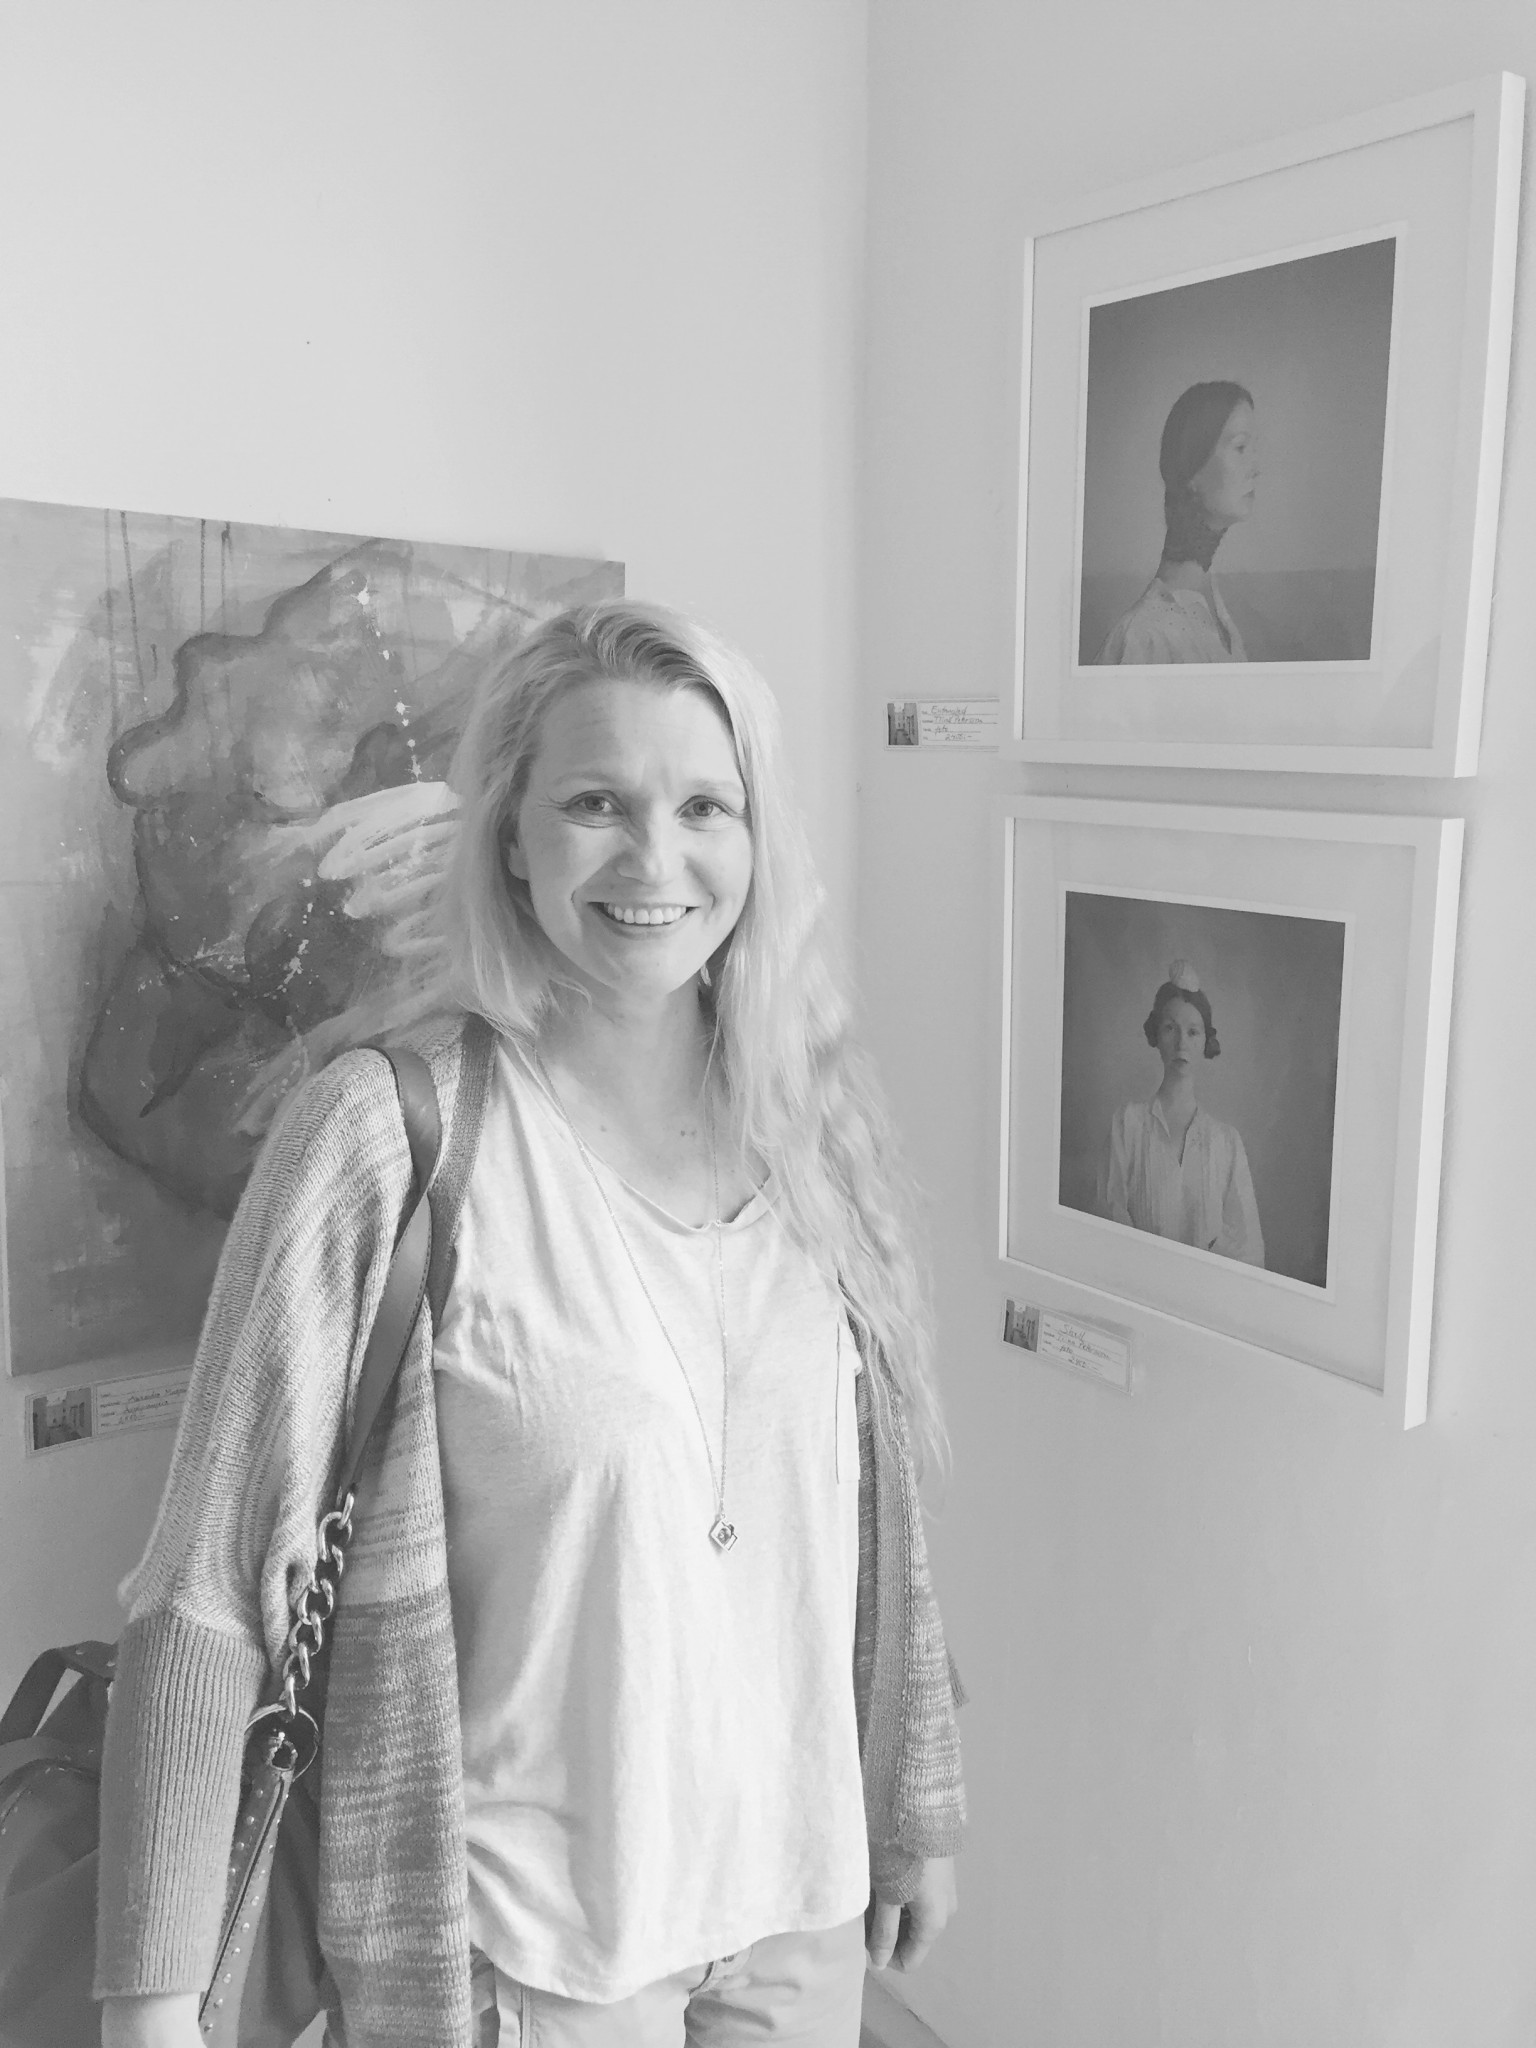 Tiina Petersson exhibition Skövde May 2016